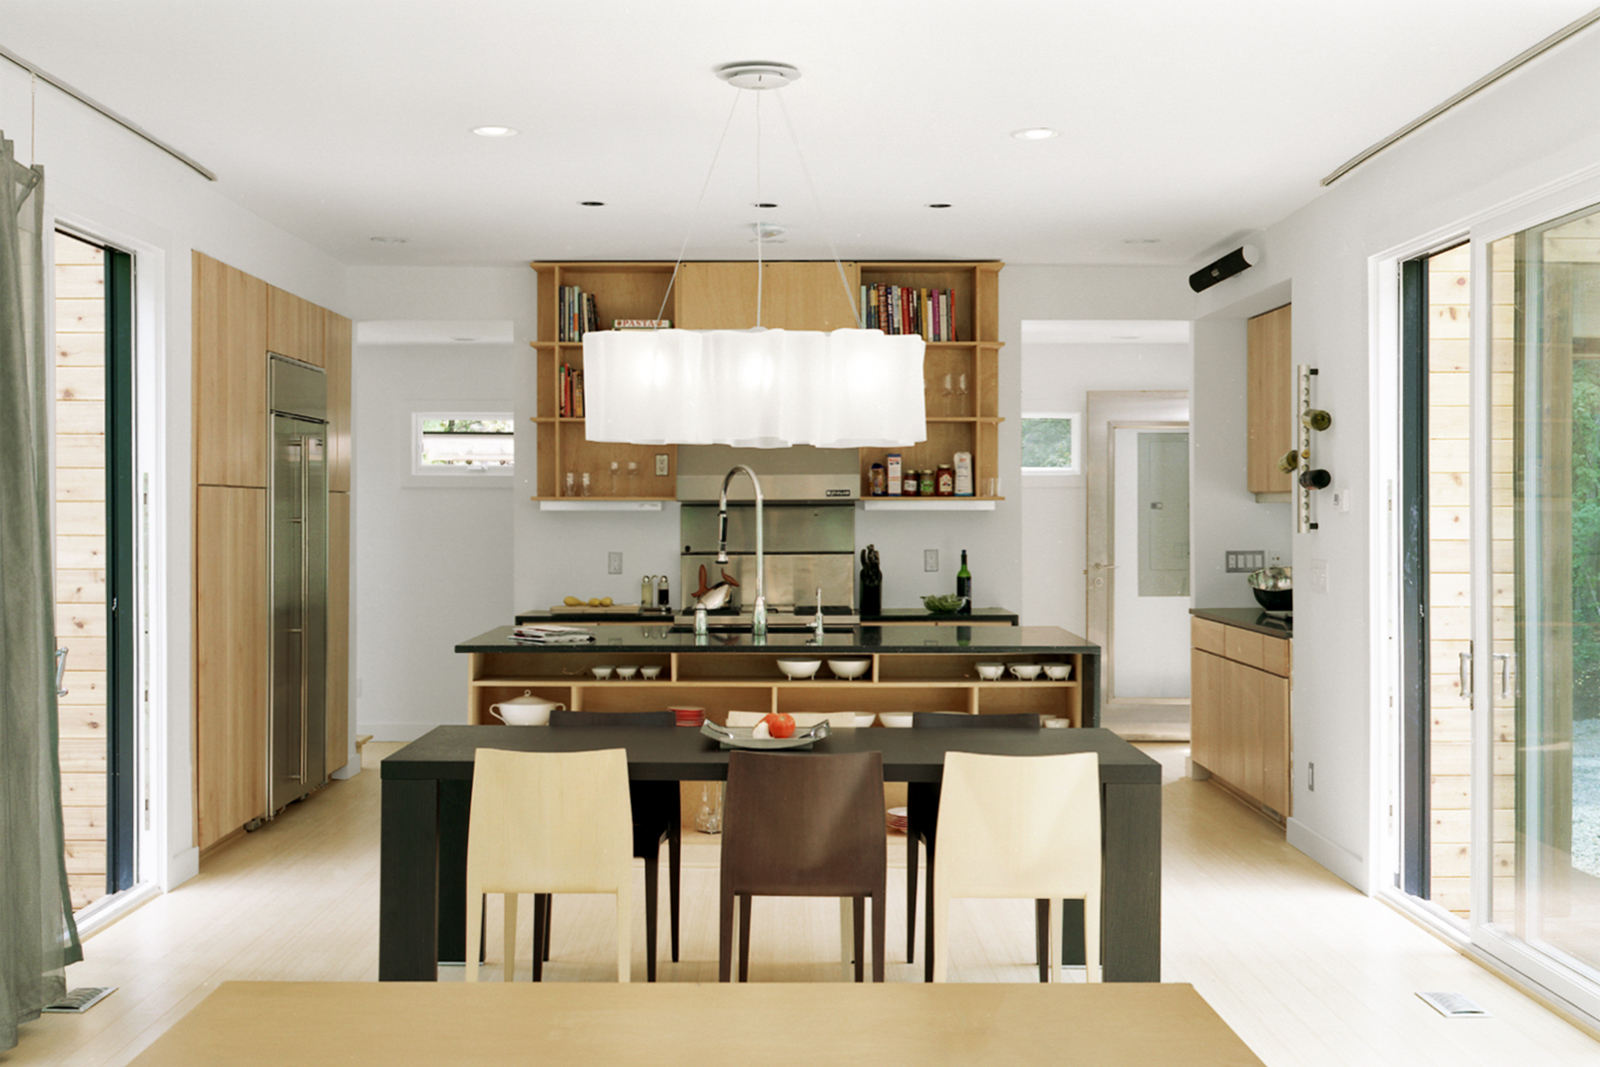 10-res4-resolution-4-architecture-modern-modular-house-prefab-dwell-home-interior-kitchen-dining.jpg